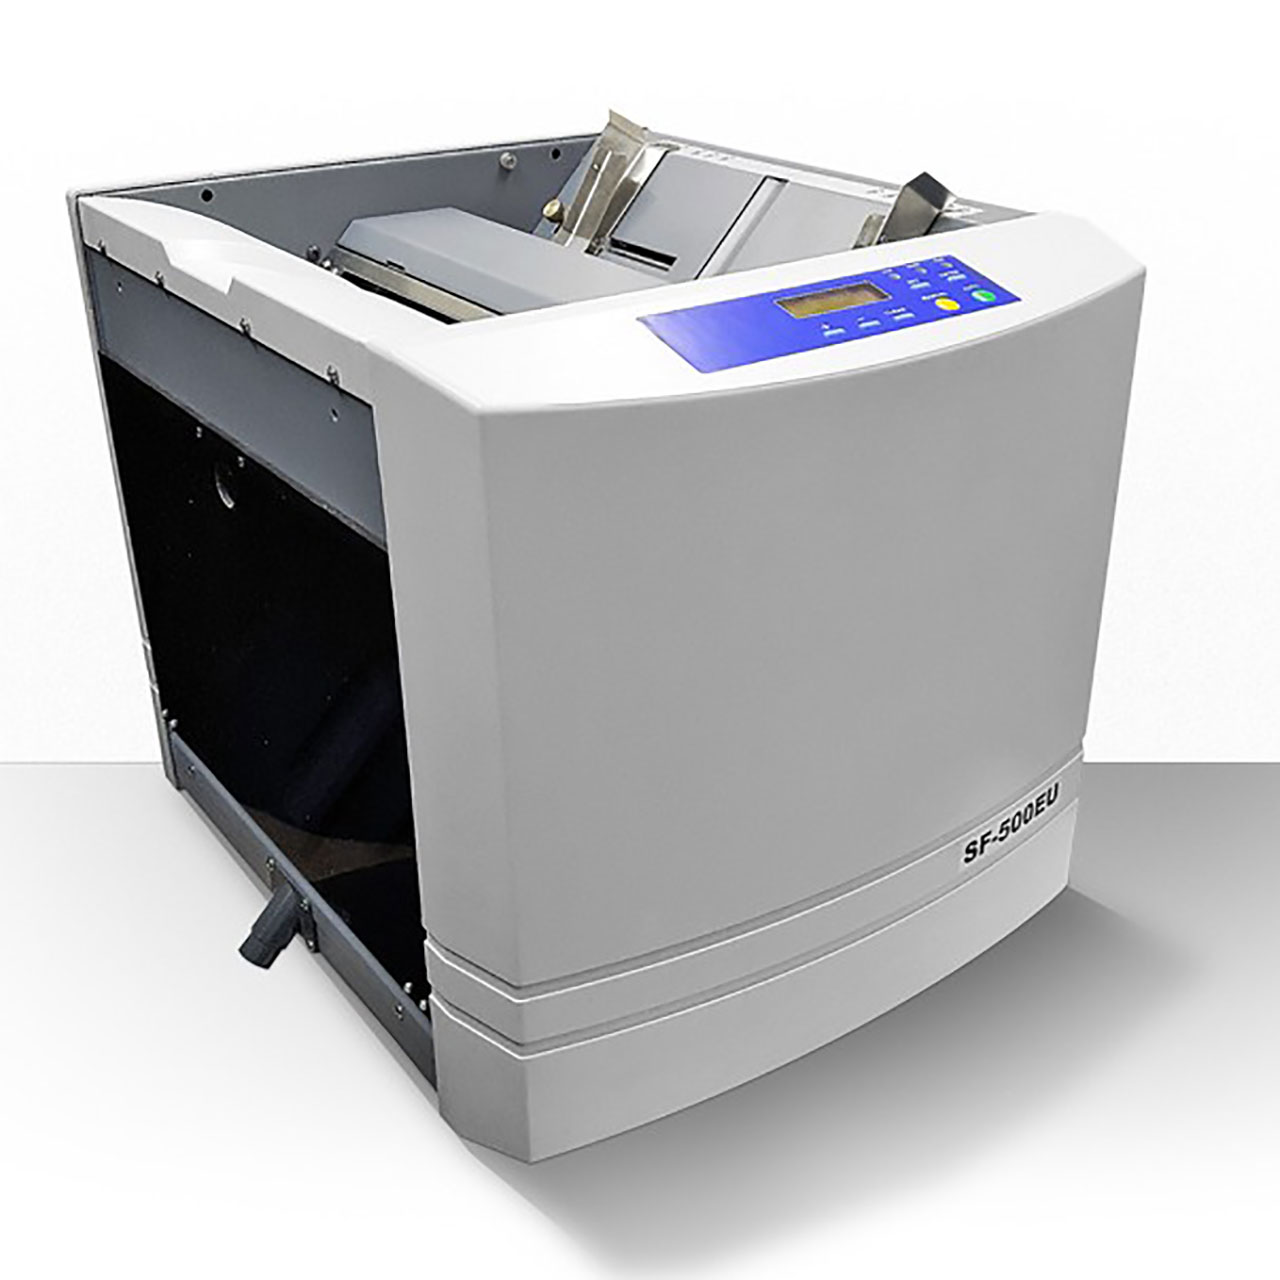 Broschürenautomat SUPERFAX SF-500EU